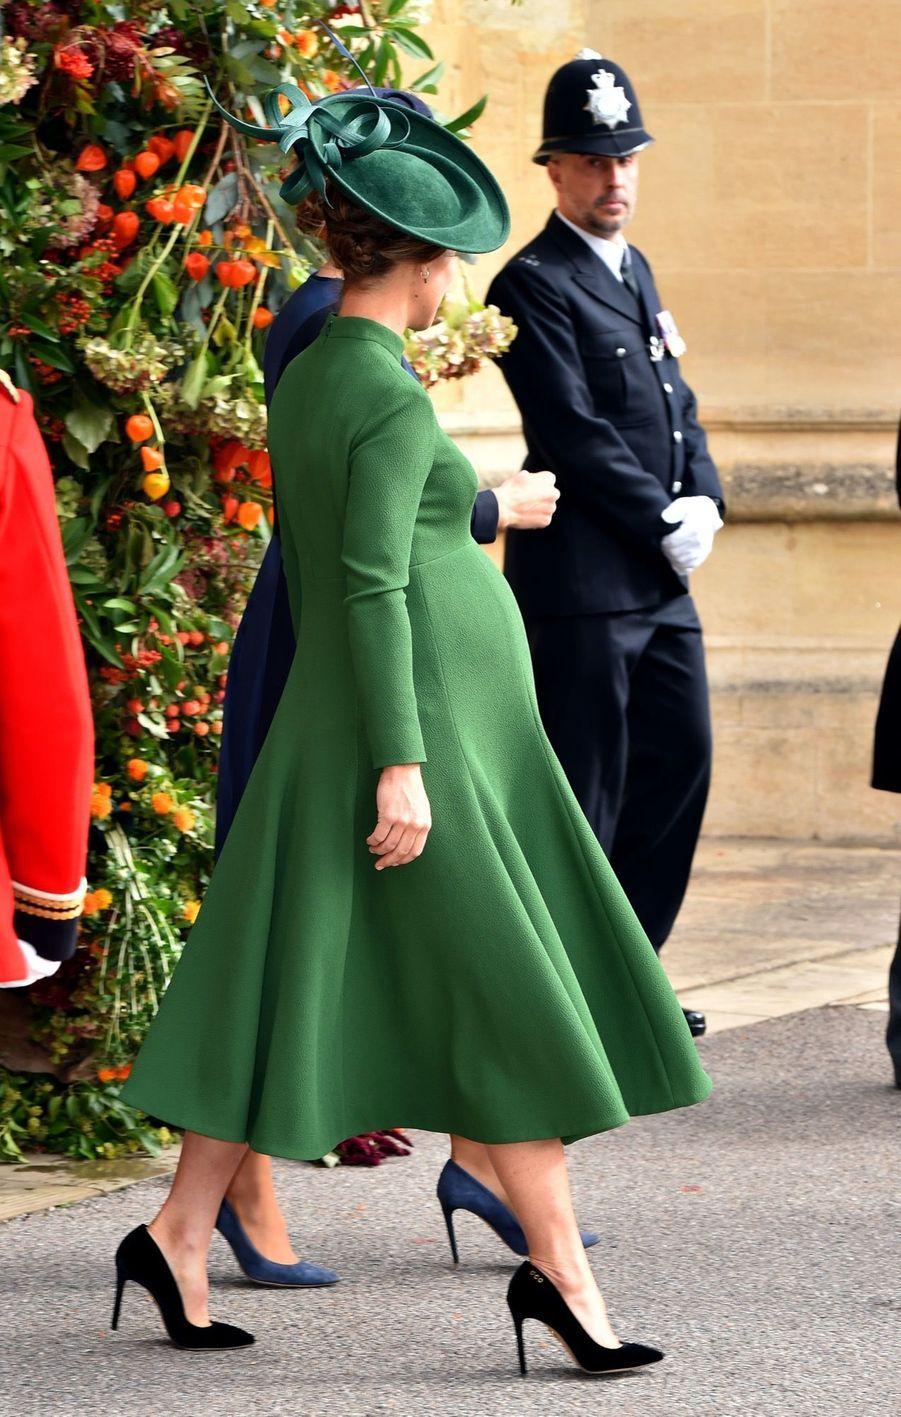 Pippa Middleton Très Enceinte Au Mariage De La Princesse Eugenie D'York ( 4